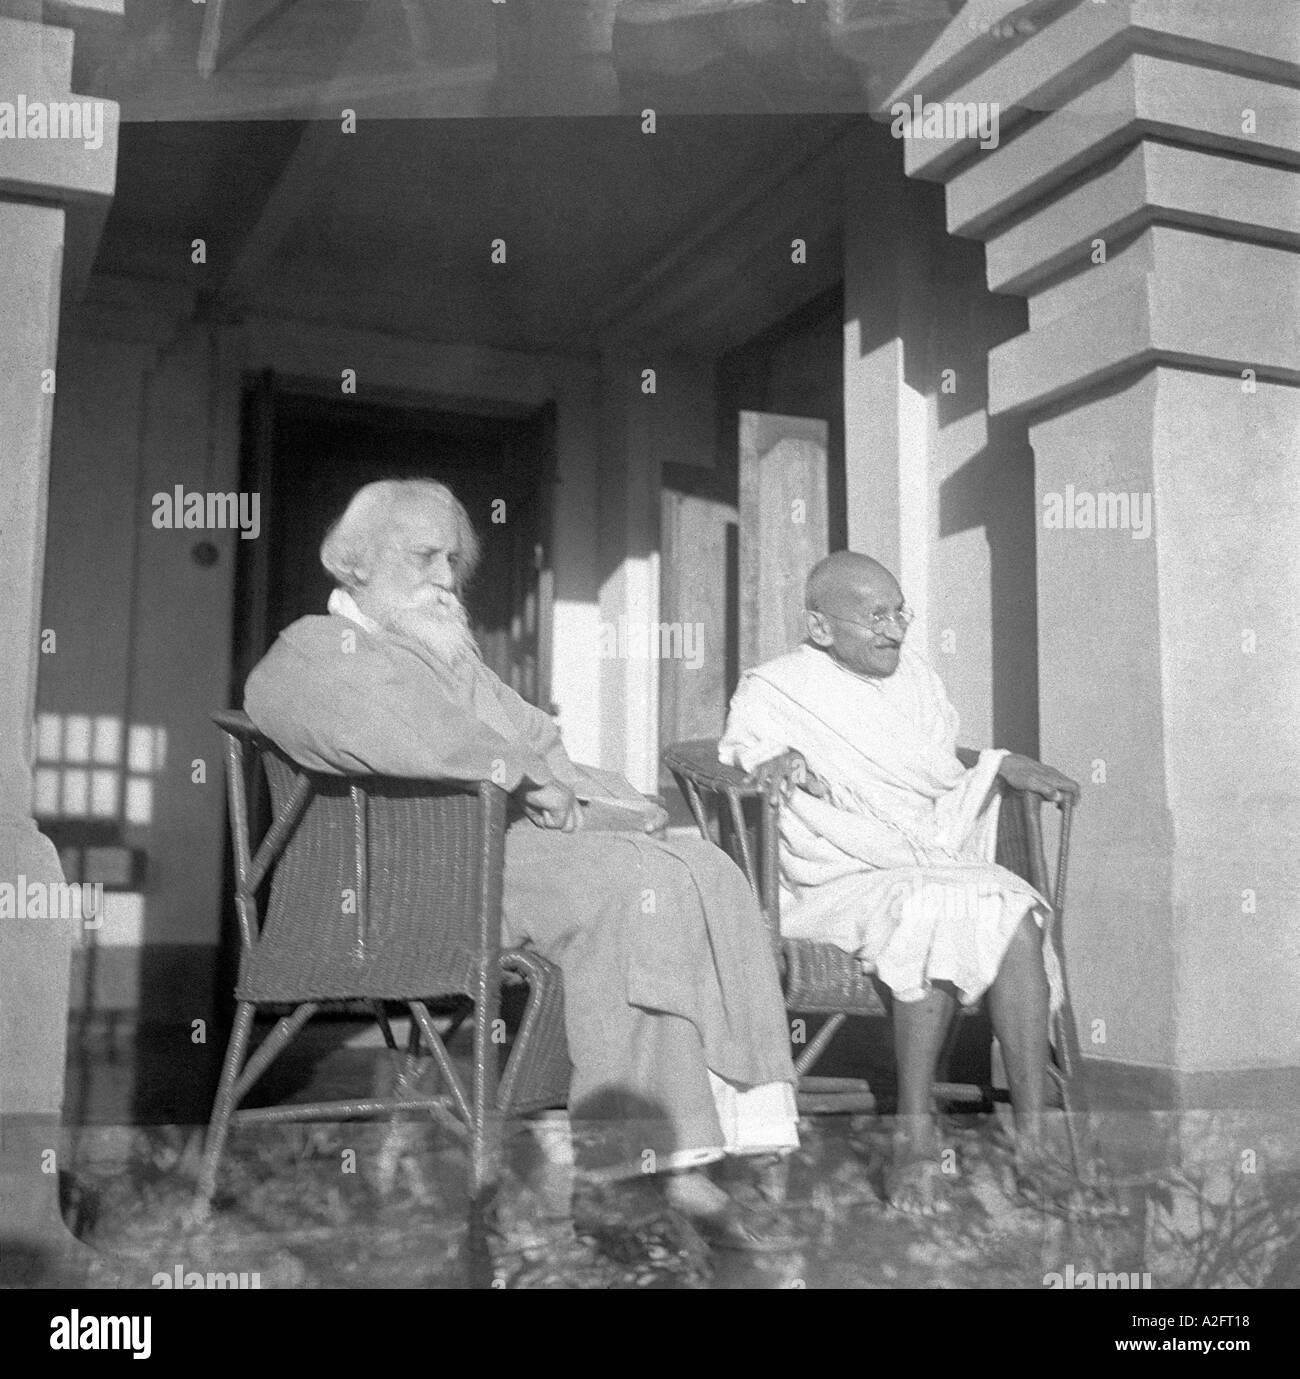 Il Mahatma Gandhi seduti su una sedia con il poeta Rabindranth Tagore a Santi Shanti niketan Kolkotta West Bengal India Febbraio 1940 Immagini Stock